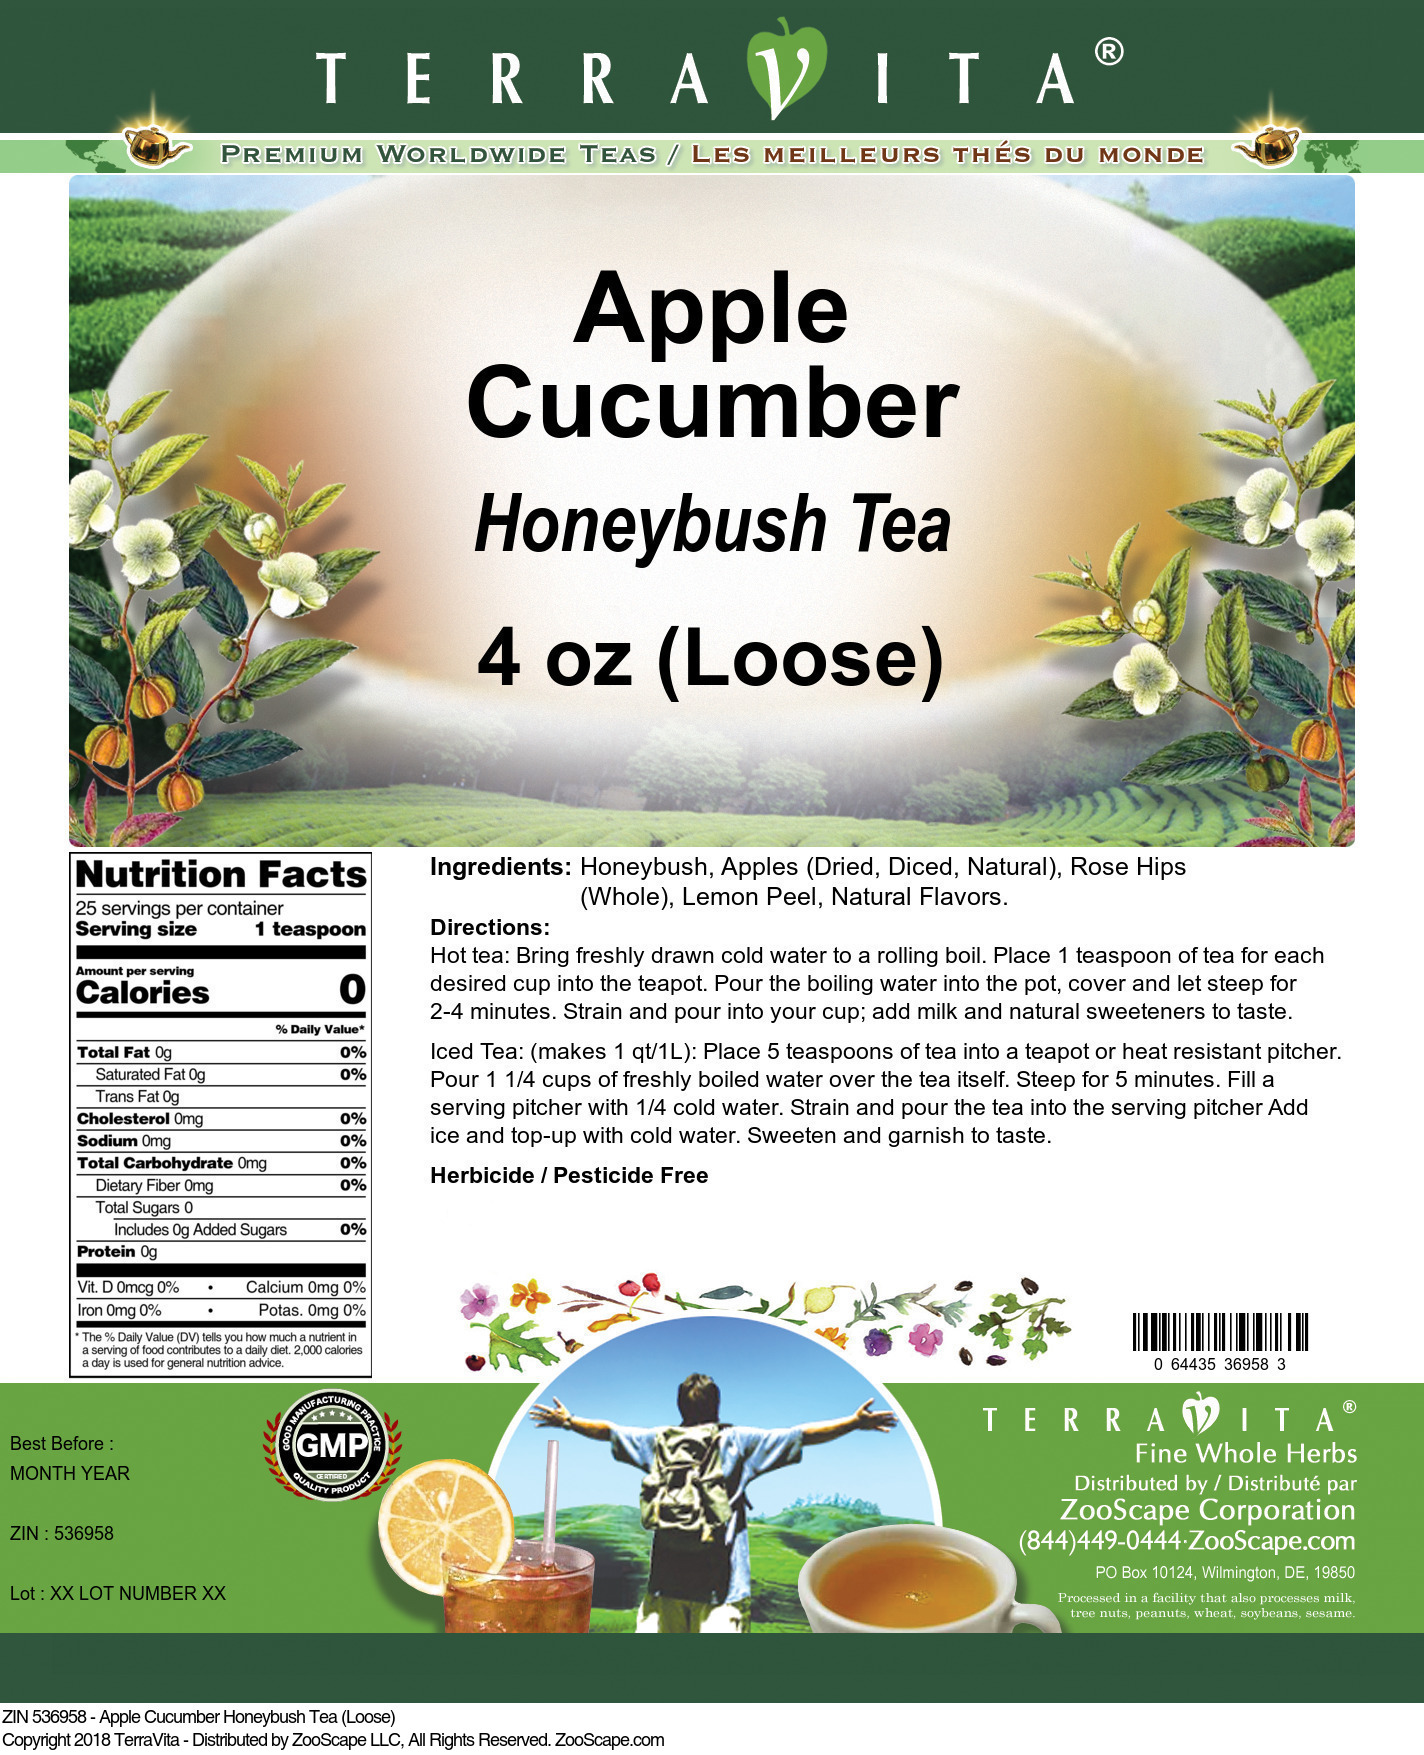 Apple Cucumber Honeybush Tea